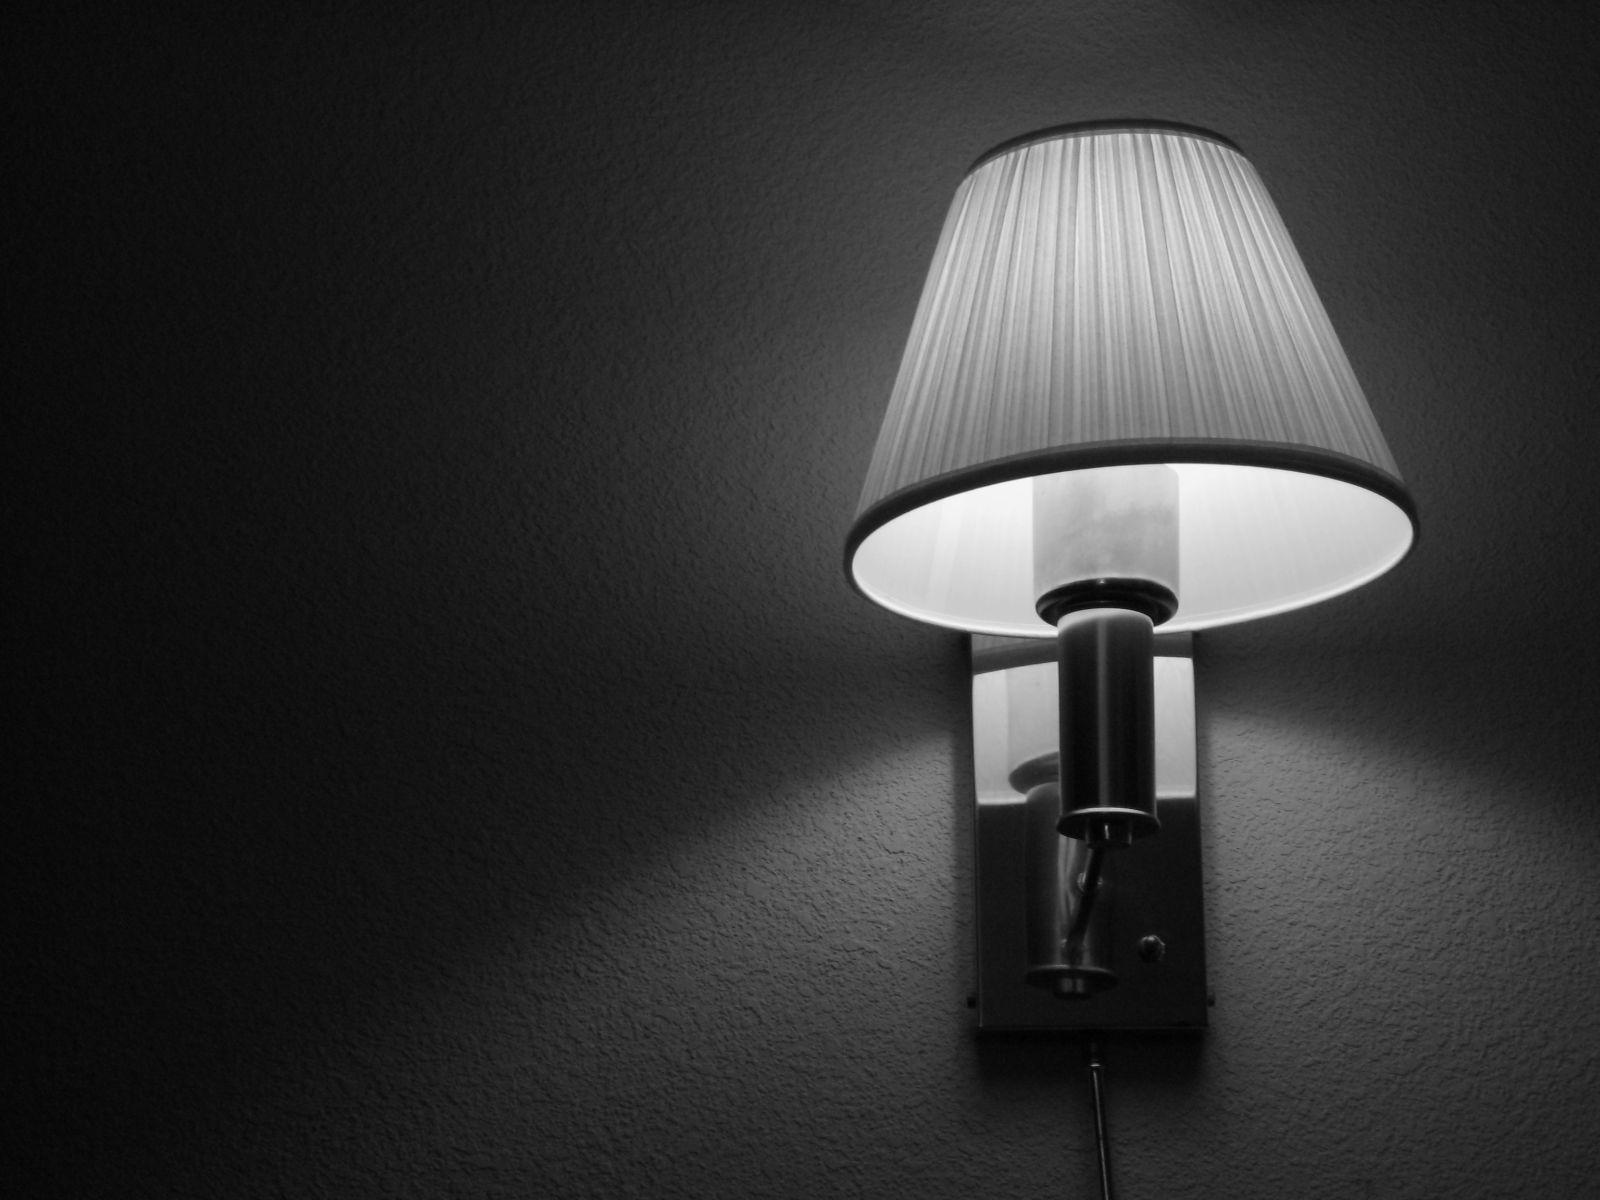 24 Wonderful Hd Lamp Wallpapers Hdwallsource Com